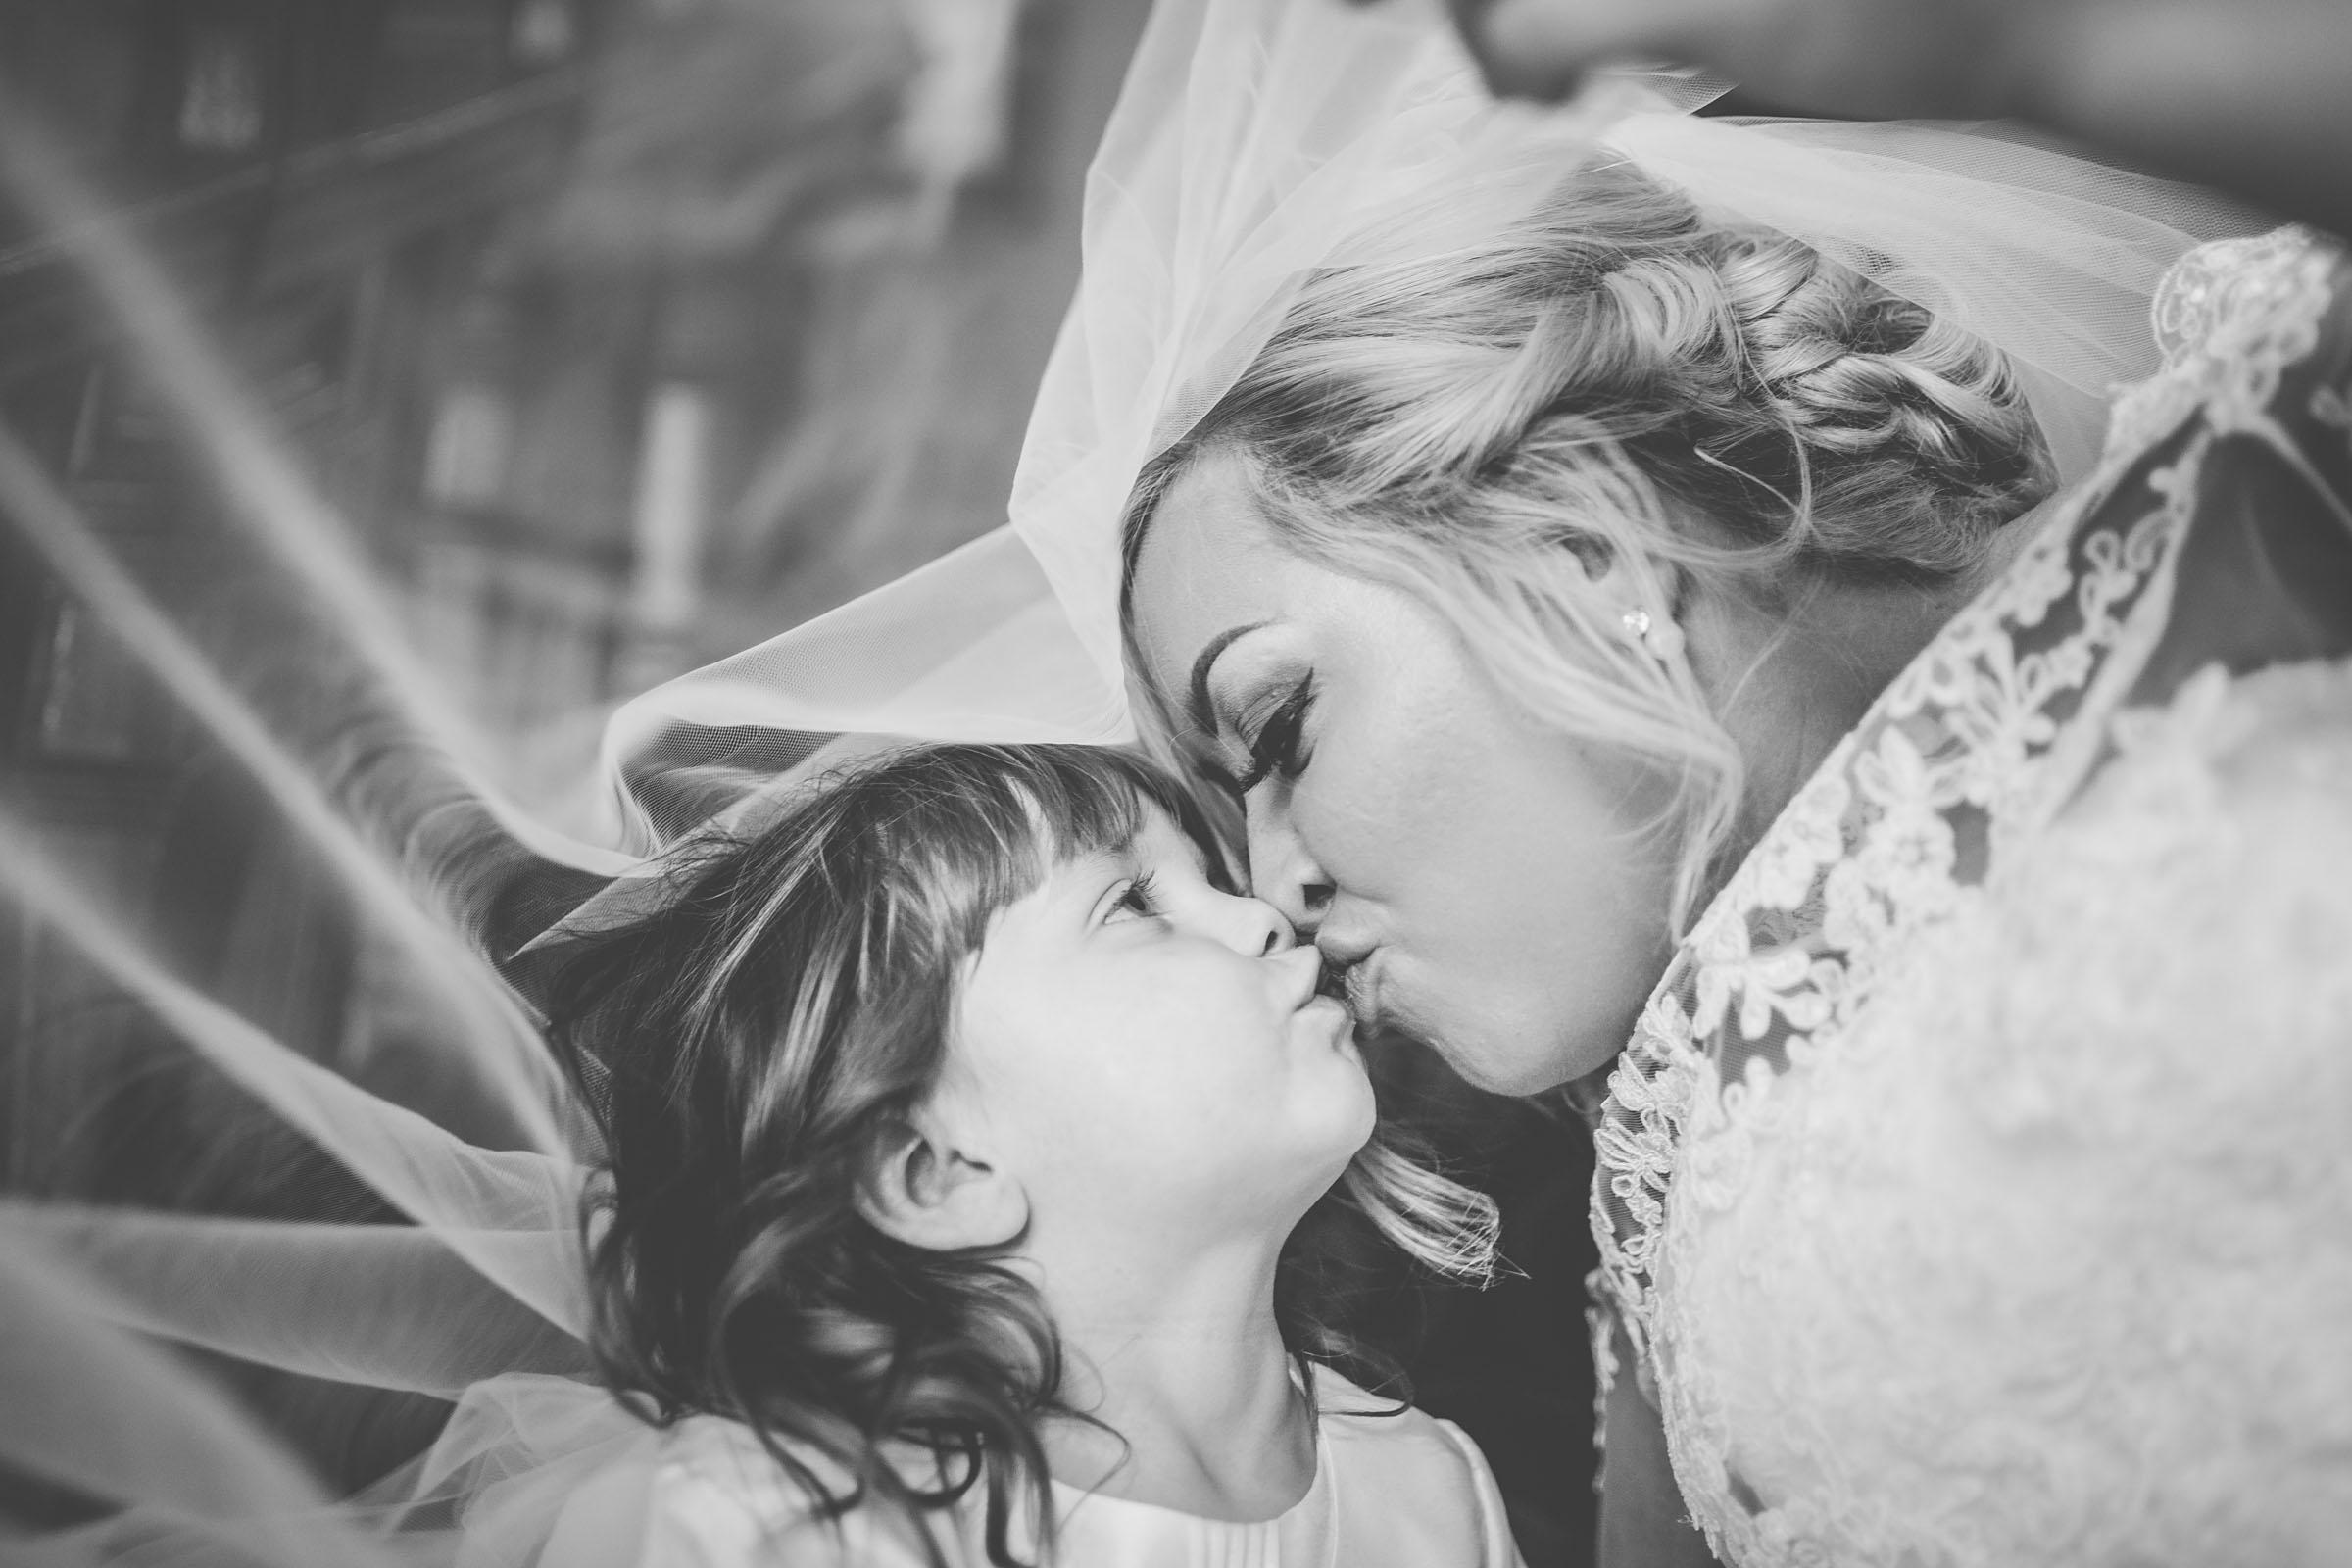 motherwell-moorings-wedding-photographer-dearlyphotography (61 of 77).jpg